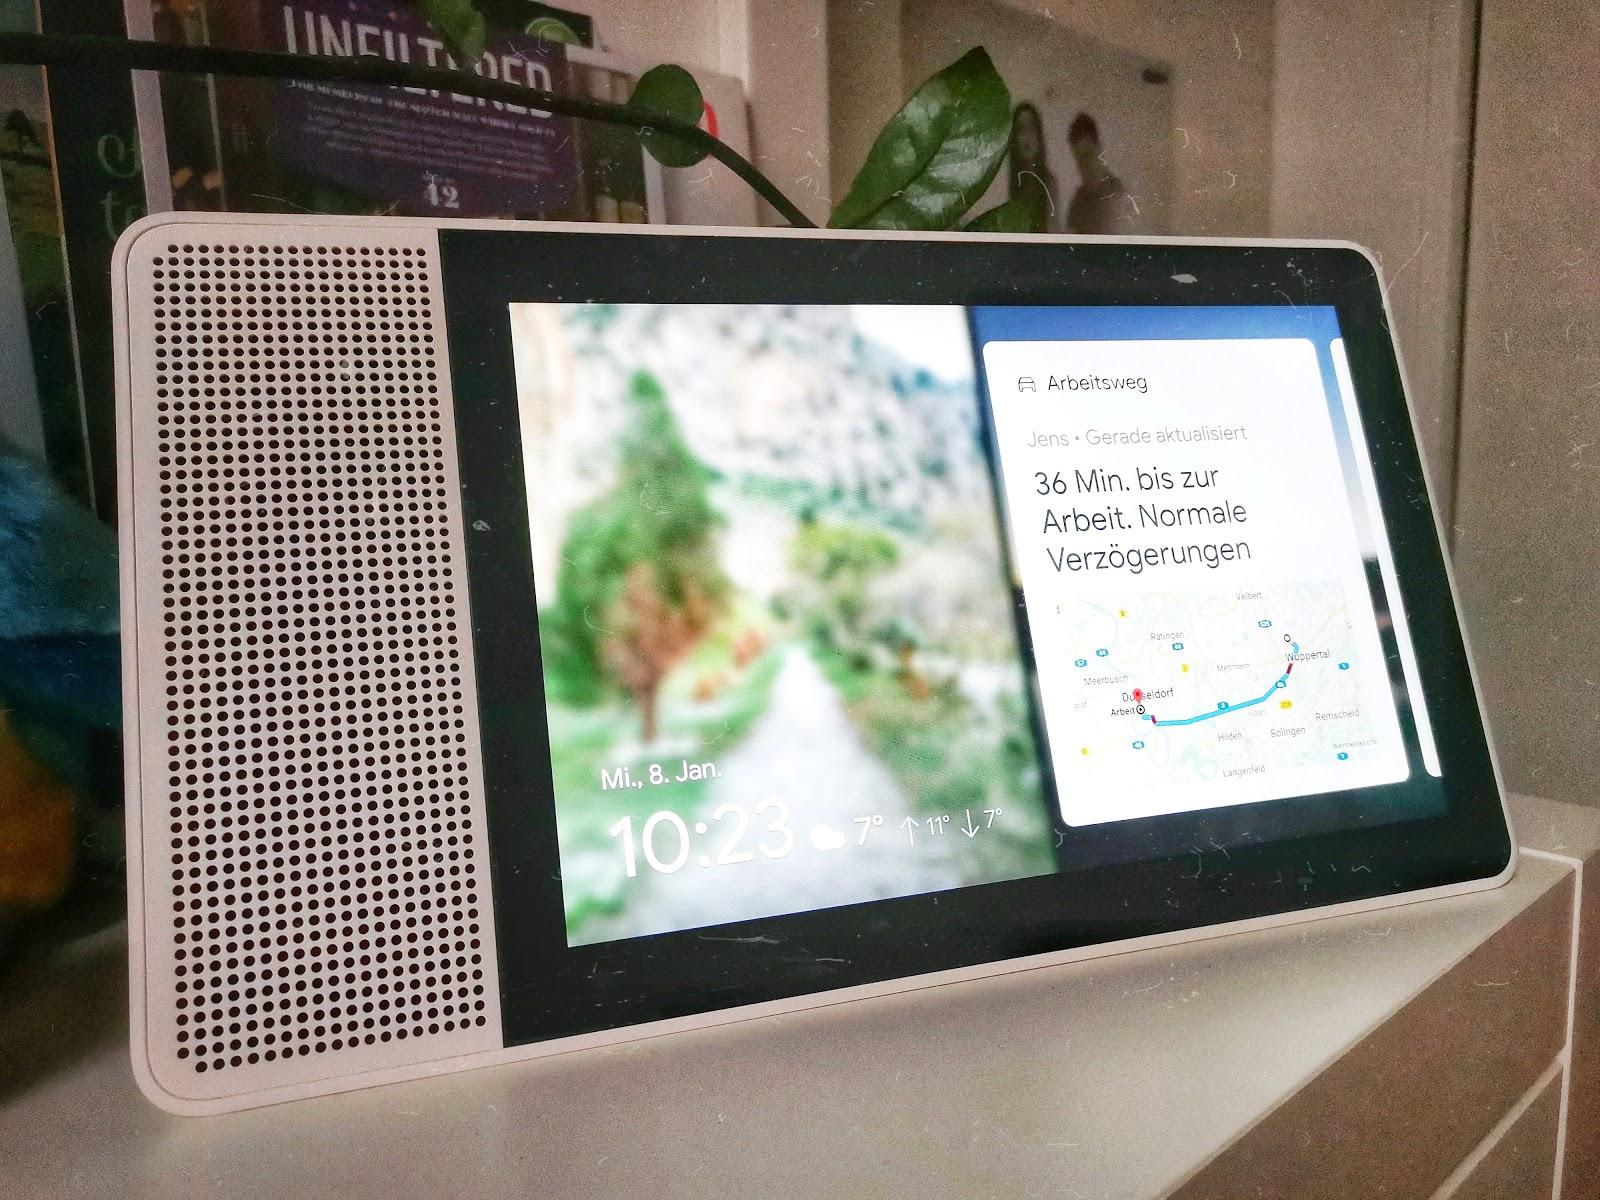 Google Assistant und Smart Displays 2020 | Der Assistant wird smarter